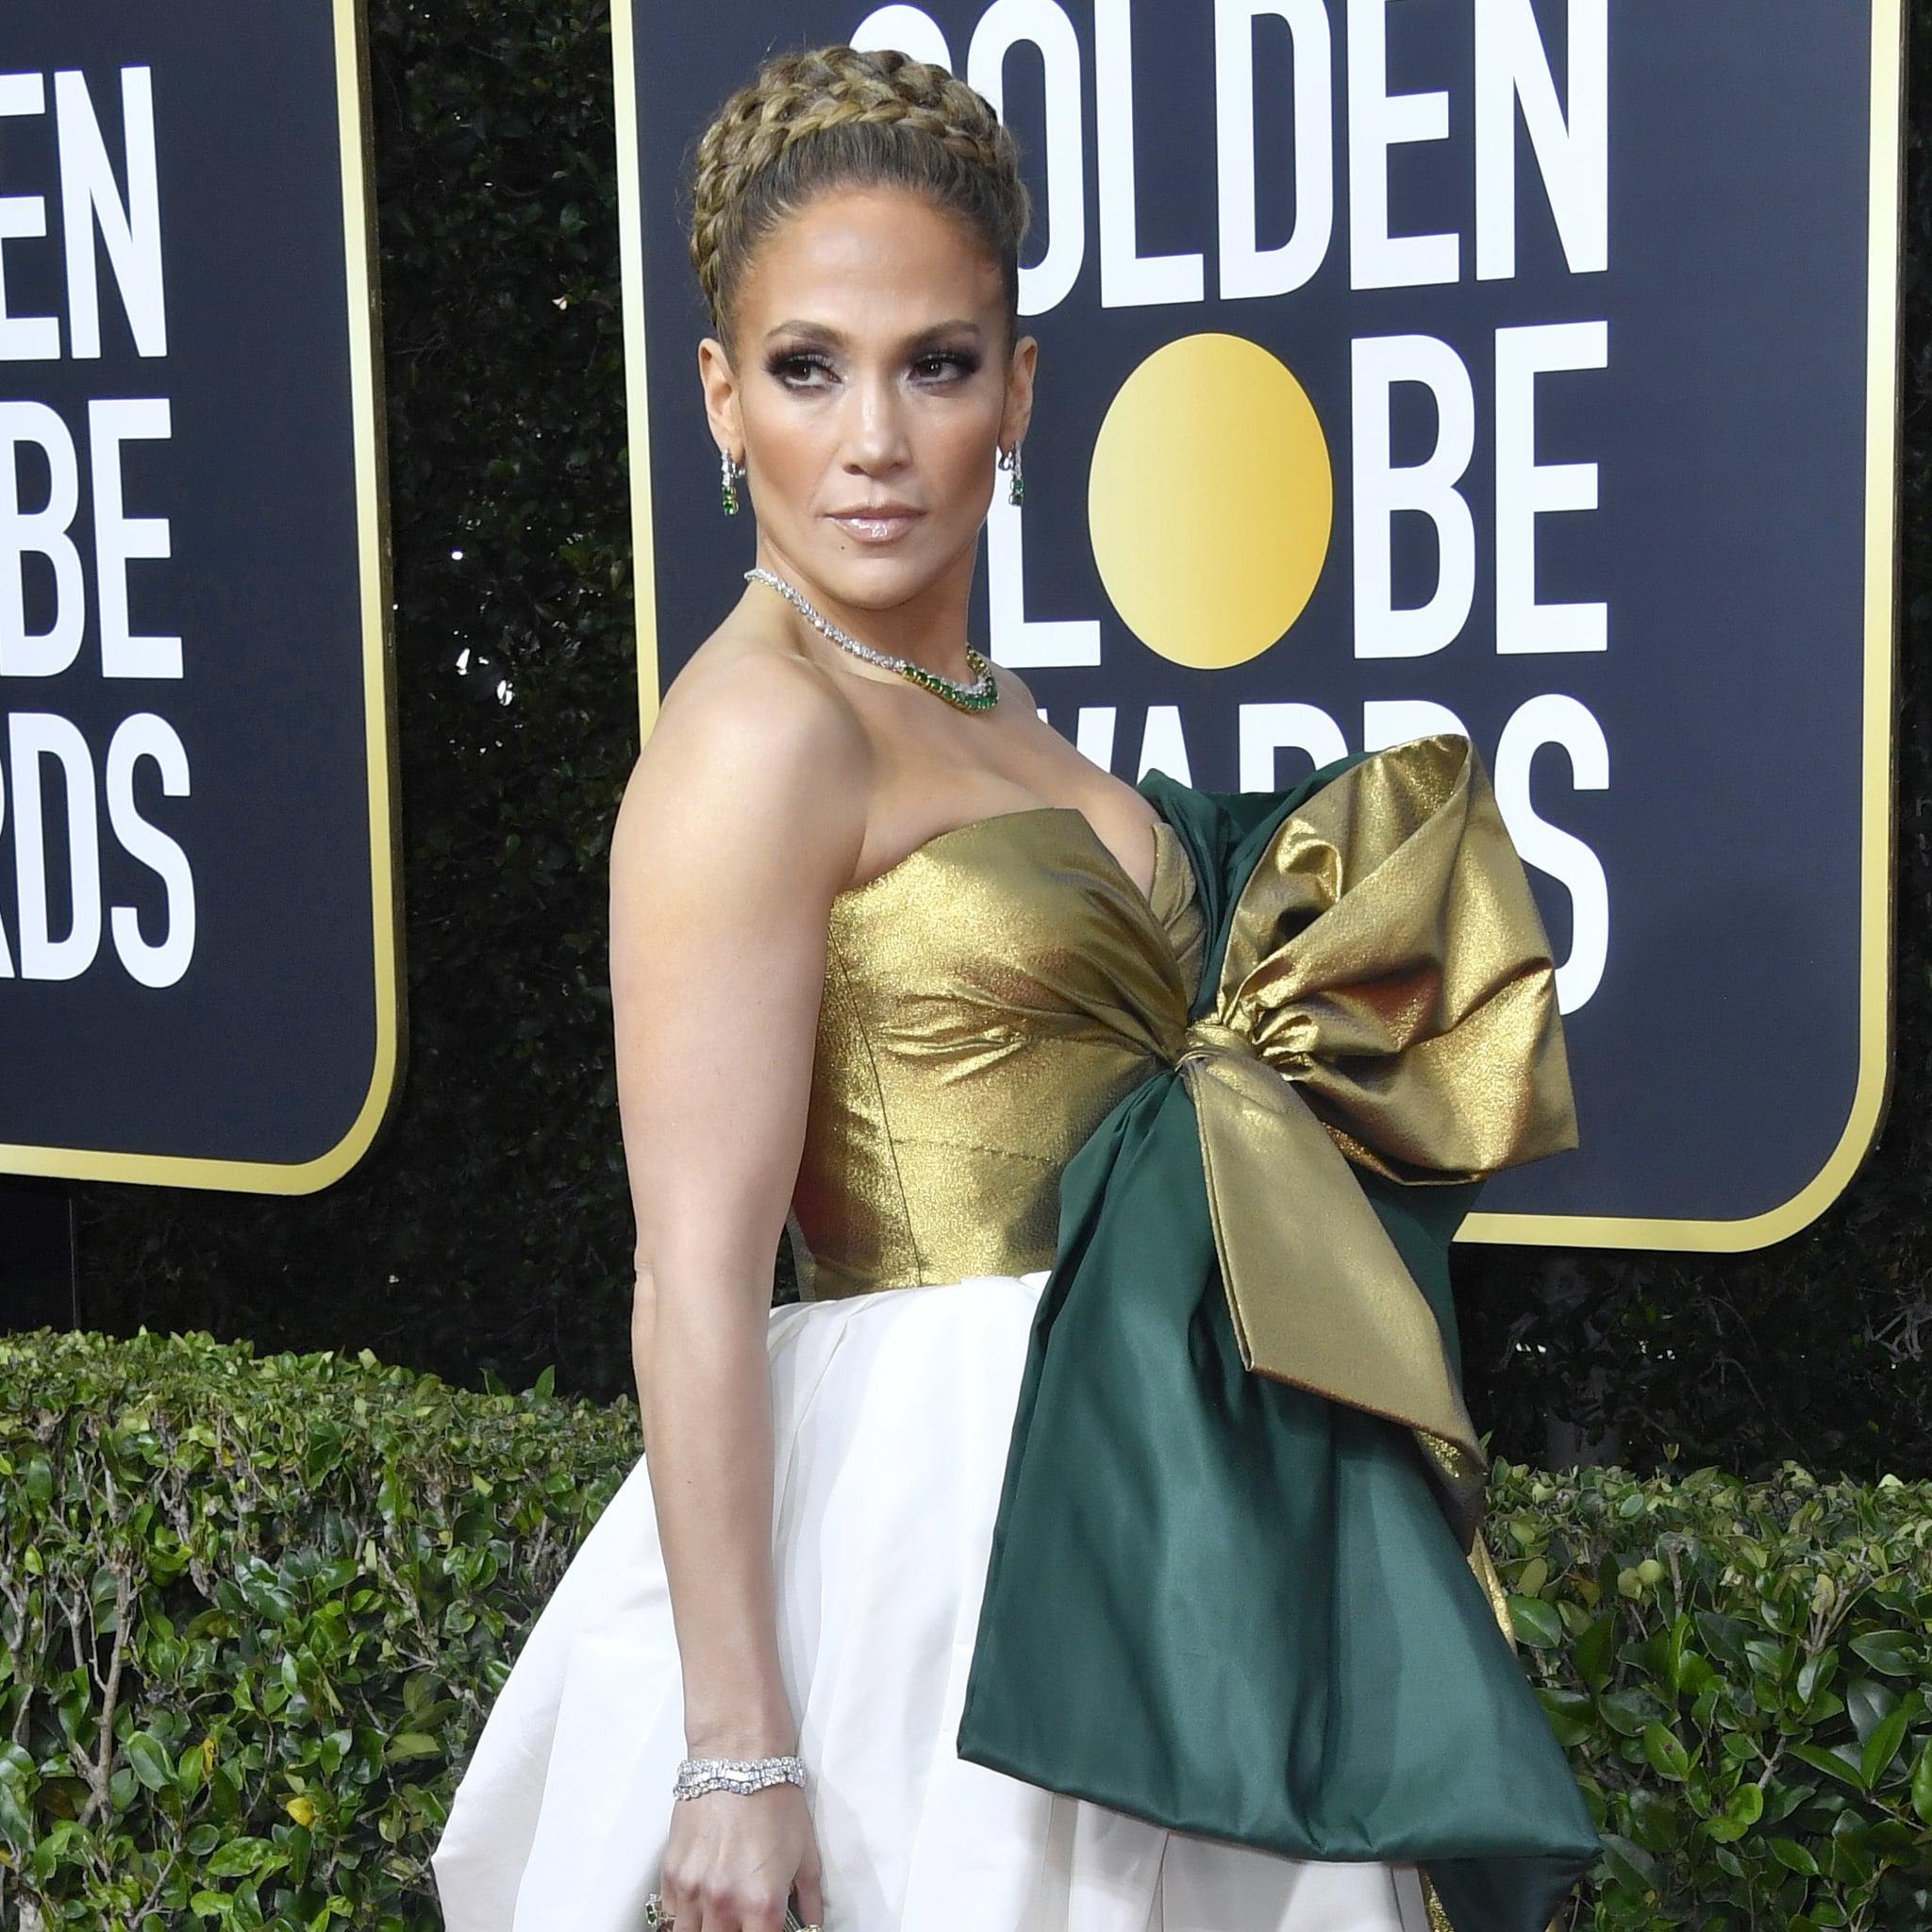 Jennifer Lopez S Giant Braided Bun At The Golden Globes Popsugar Beauty